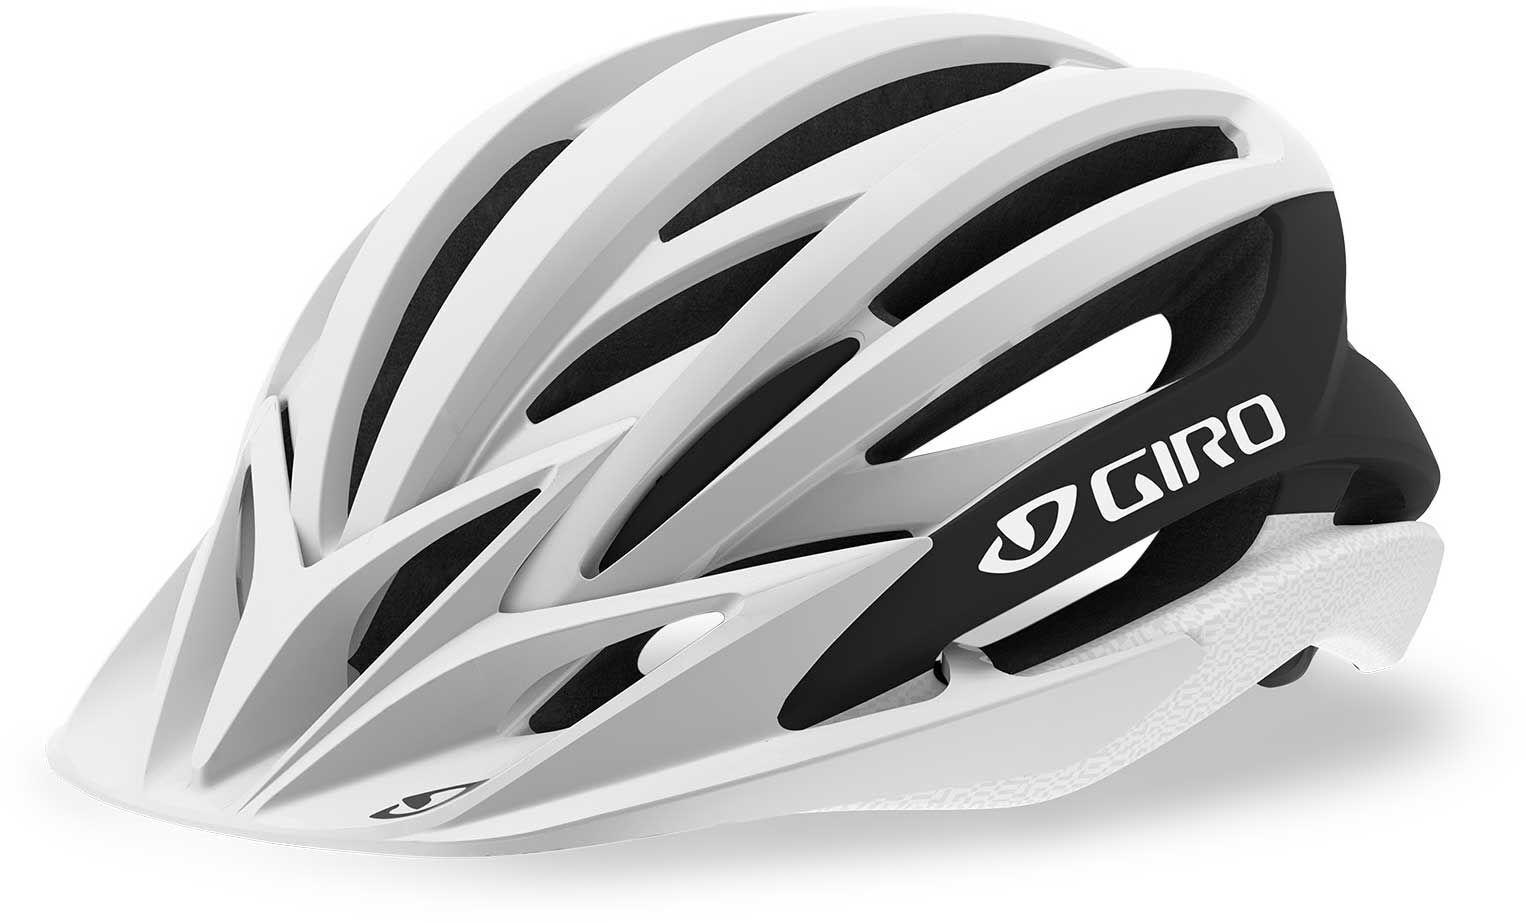 Giro Adult Artex MIPS Bike Helmet, Small, Matte White/Black